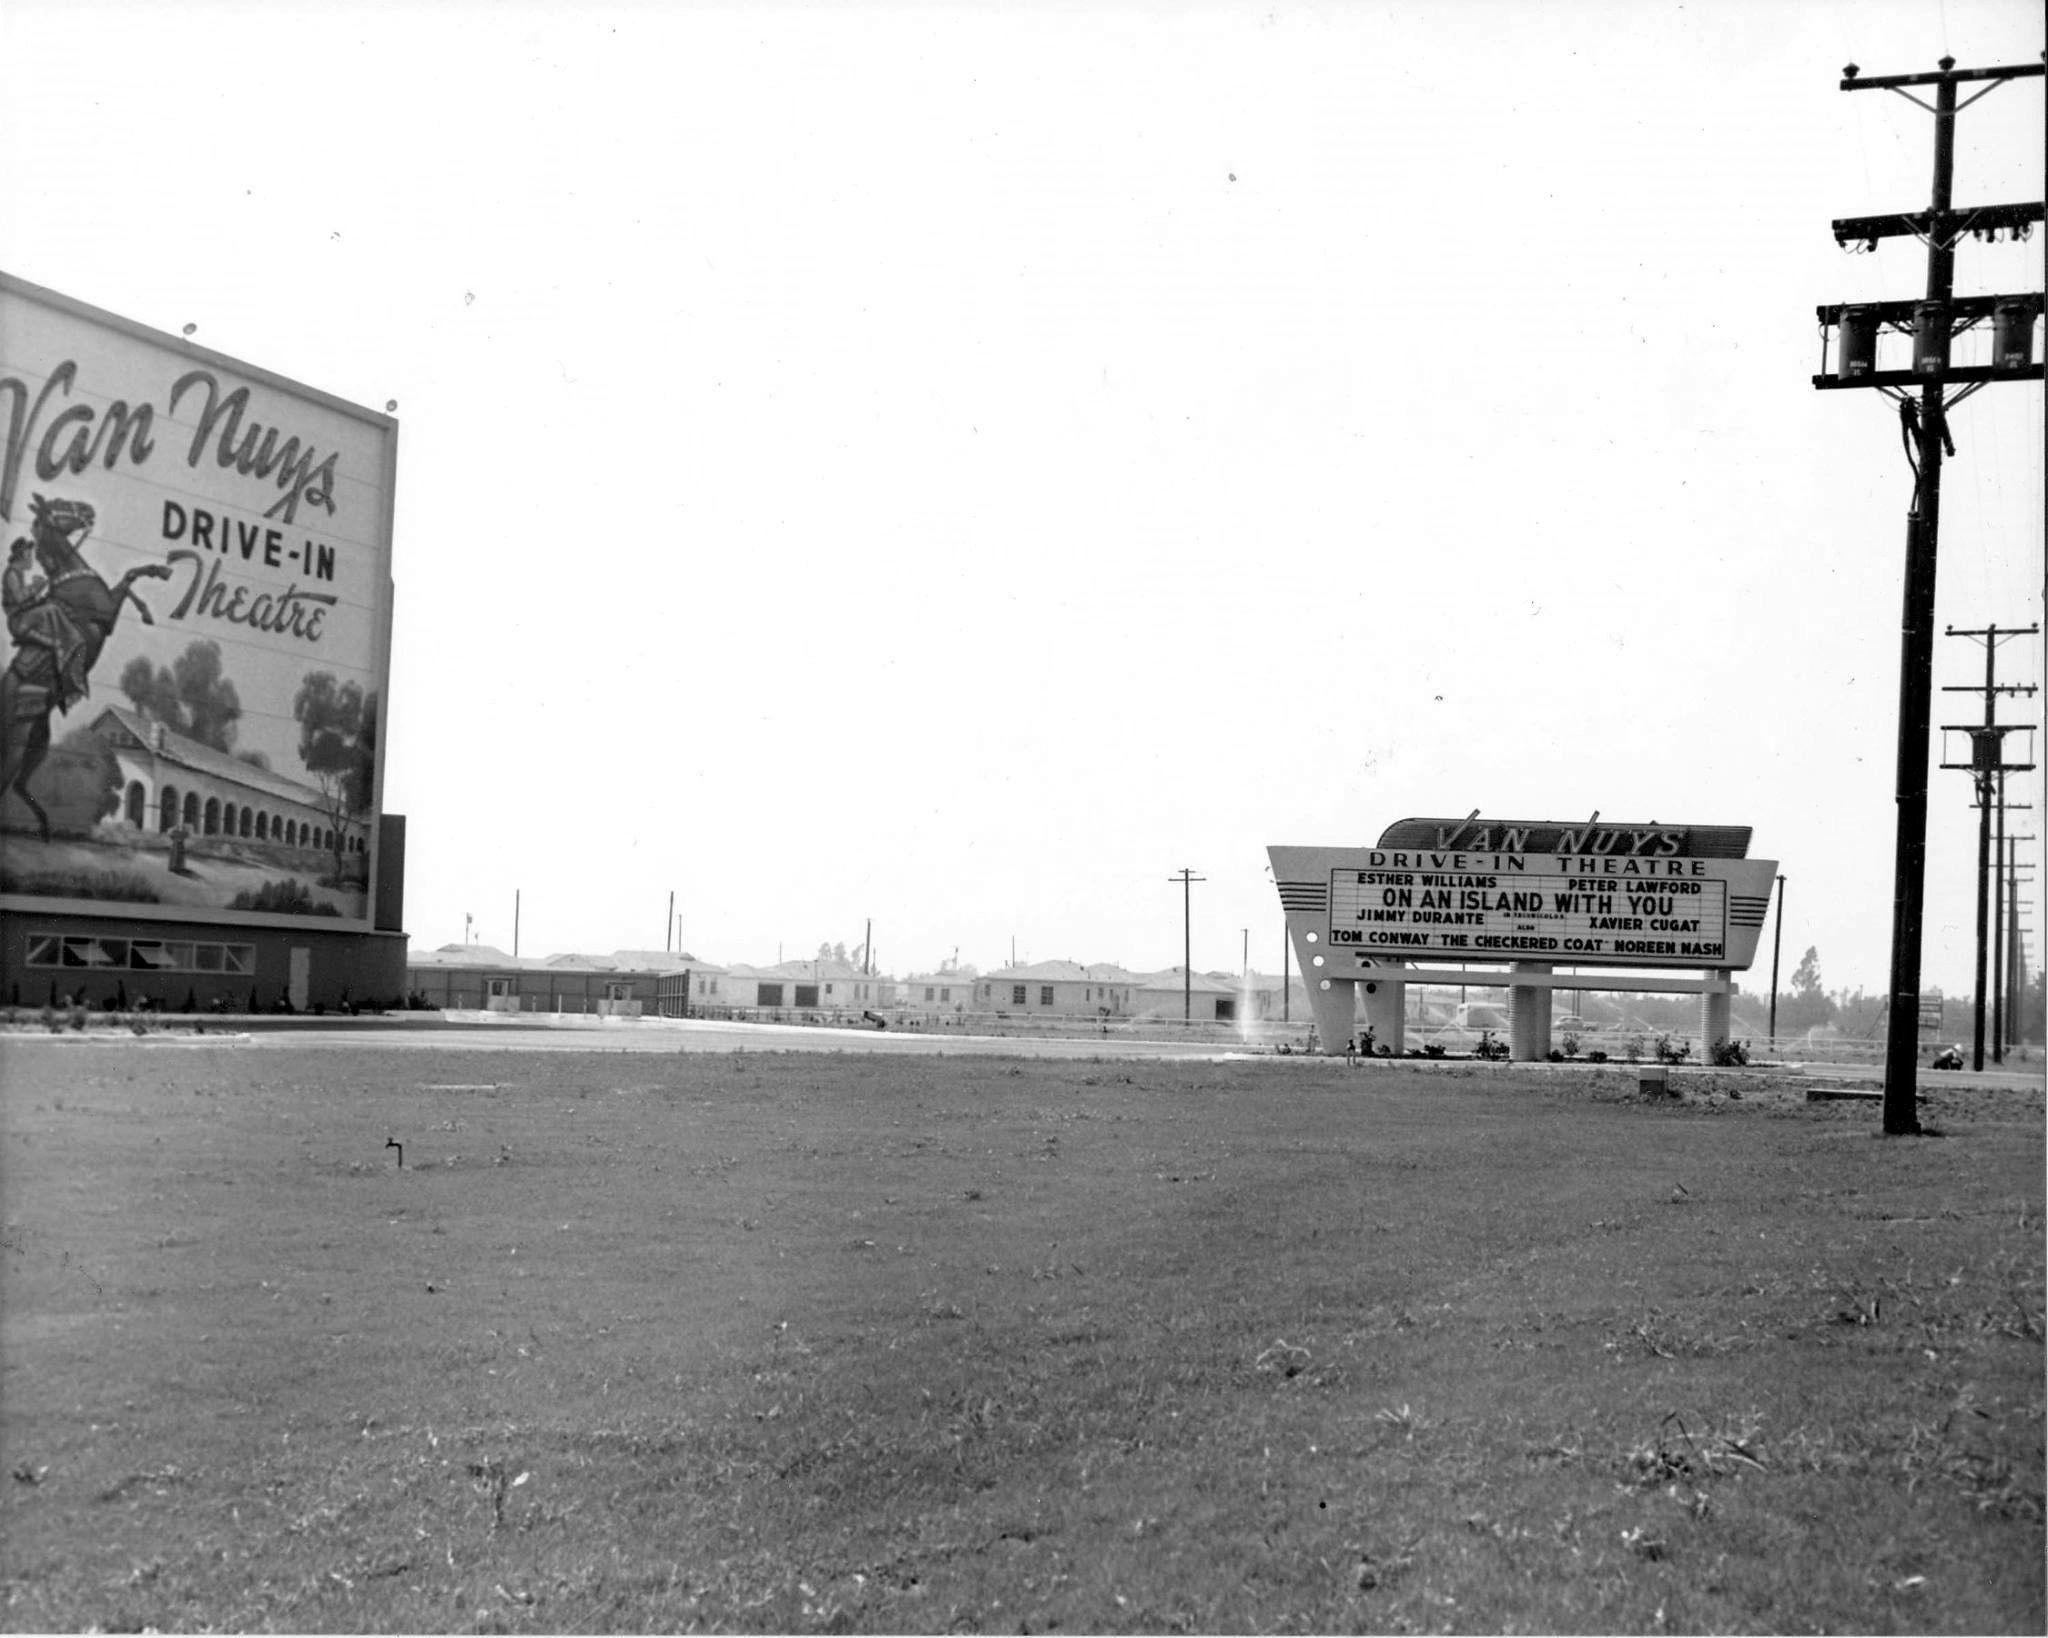 valley view movie theater website